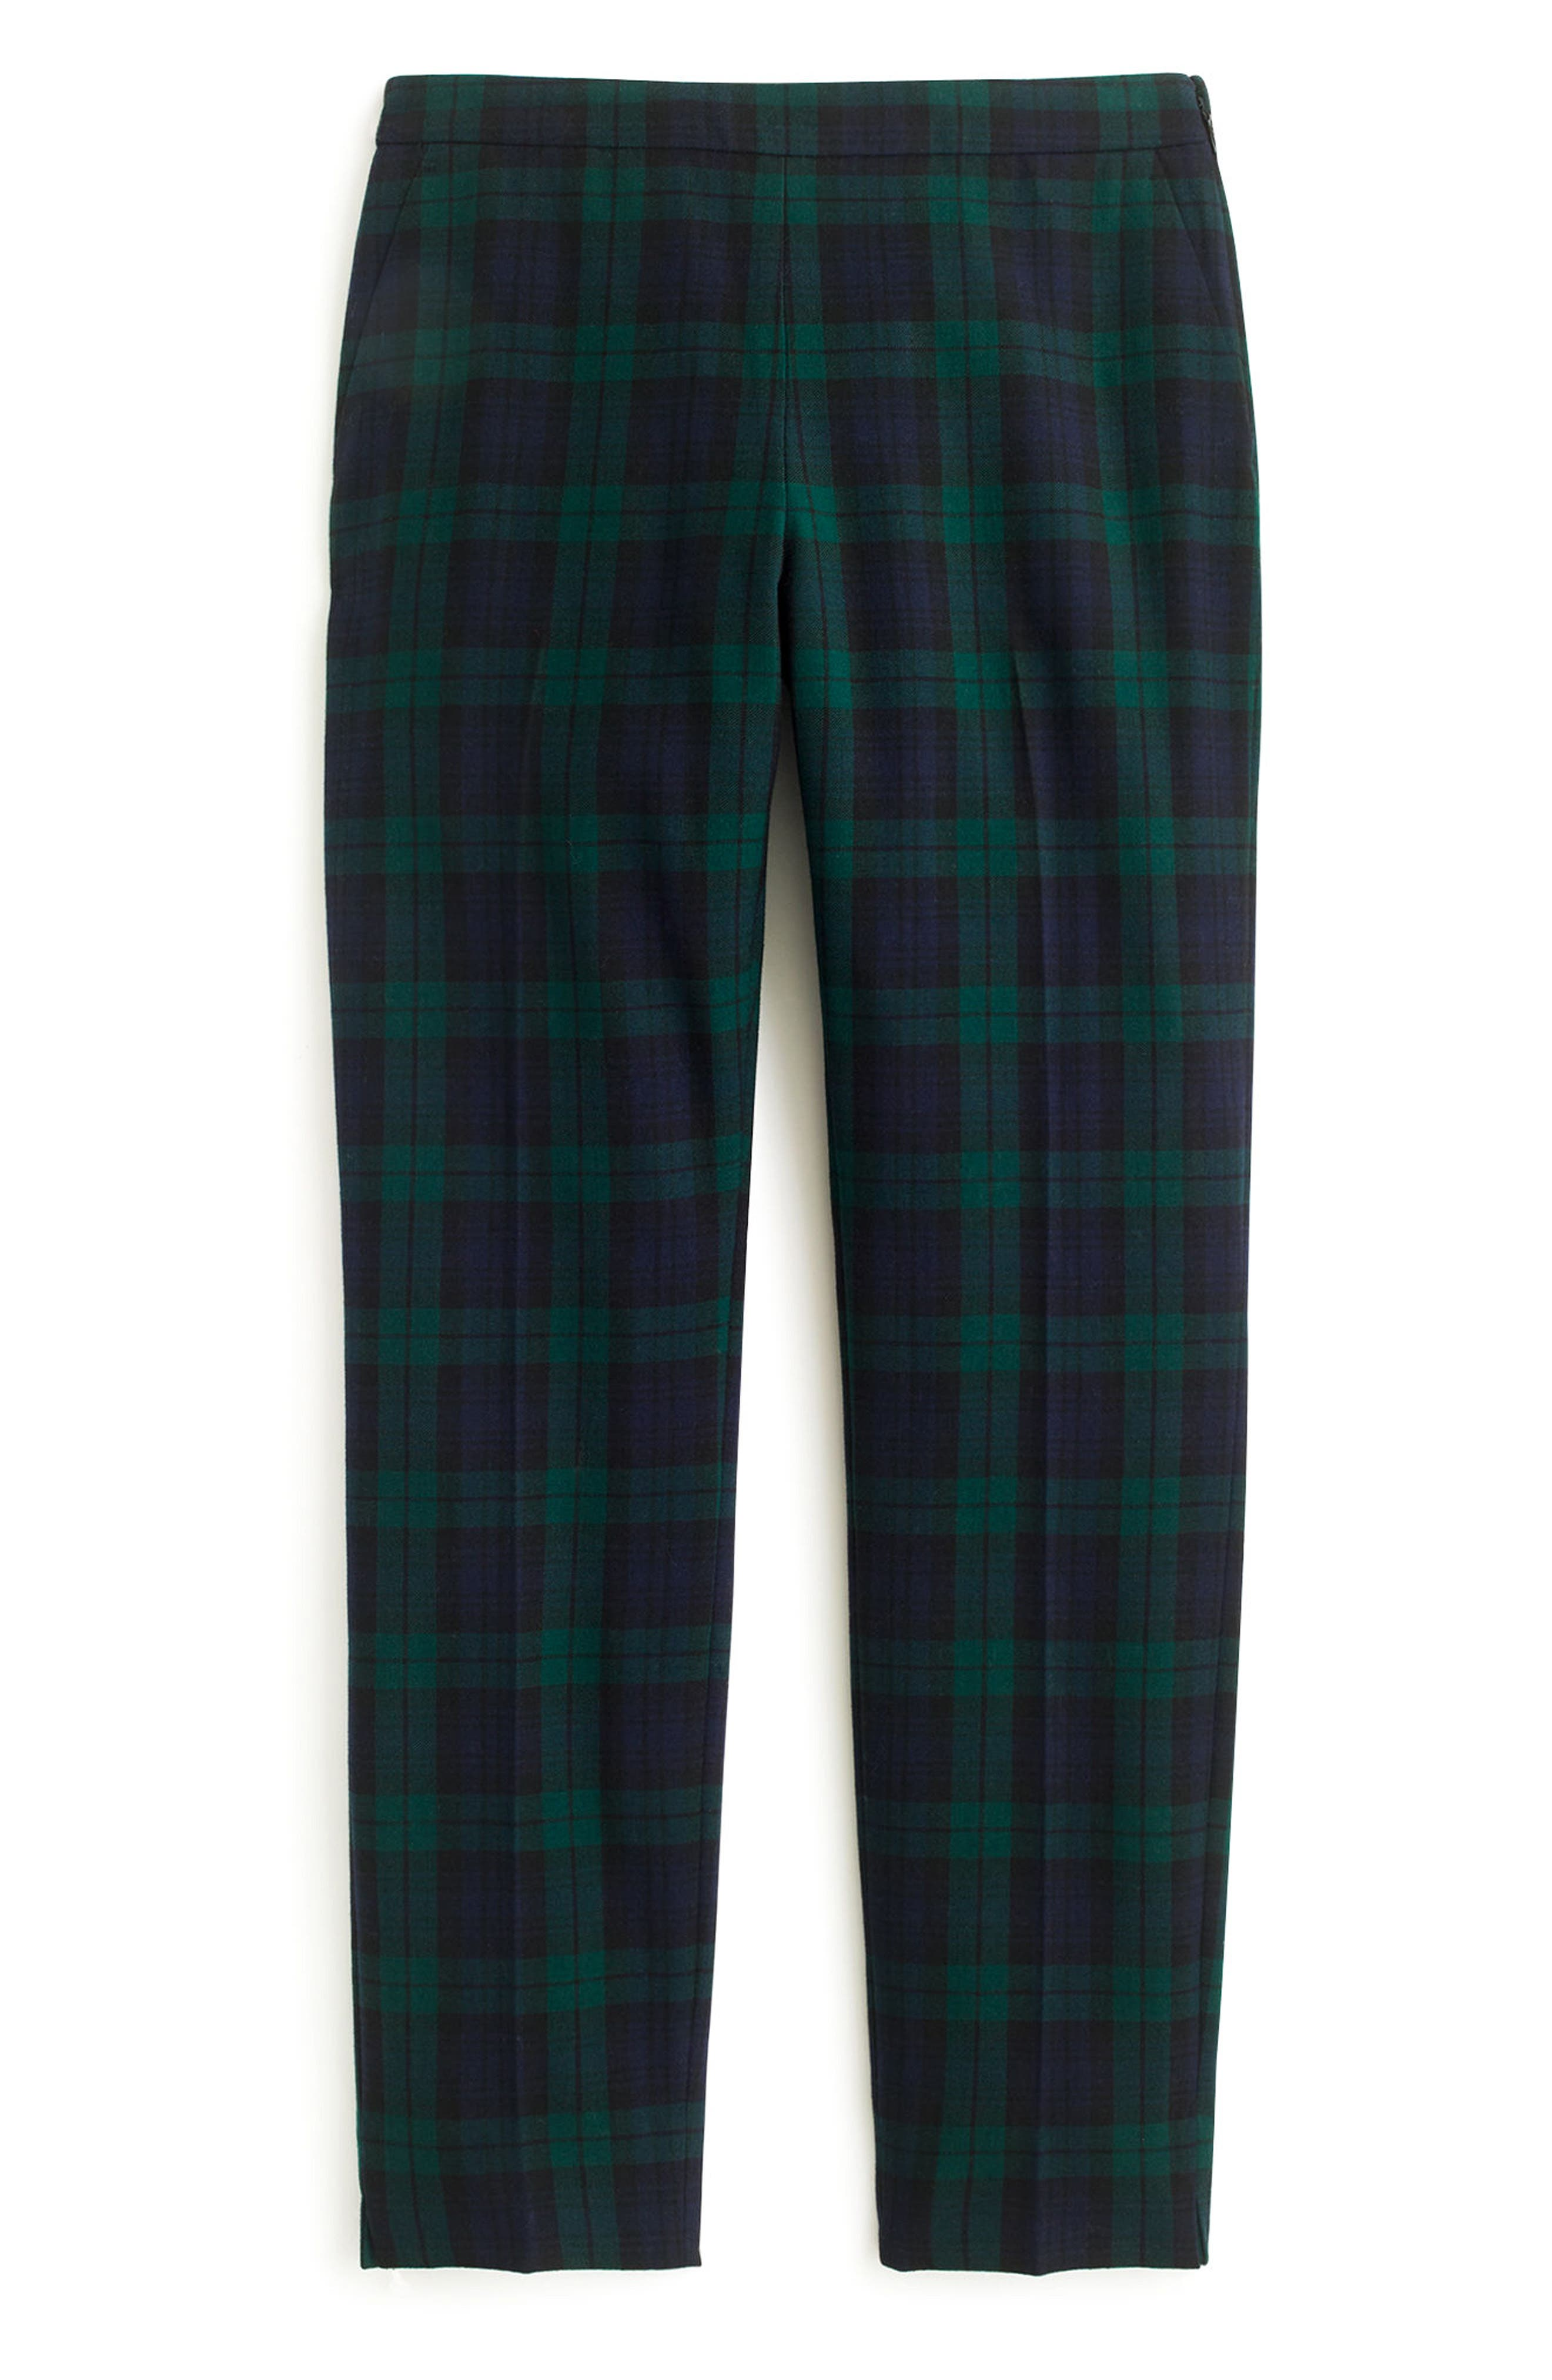 Martie Black Watch Stretch Wool Blend Crop Pants,                             Main thumbnail 1, color,                             NAVY MULTI